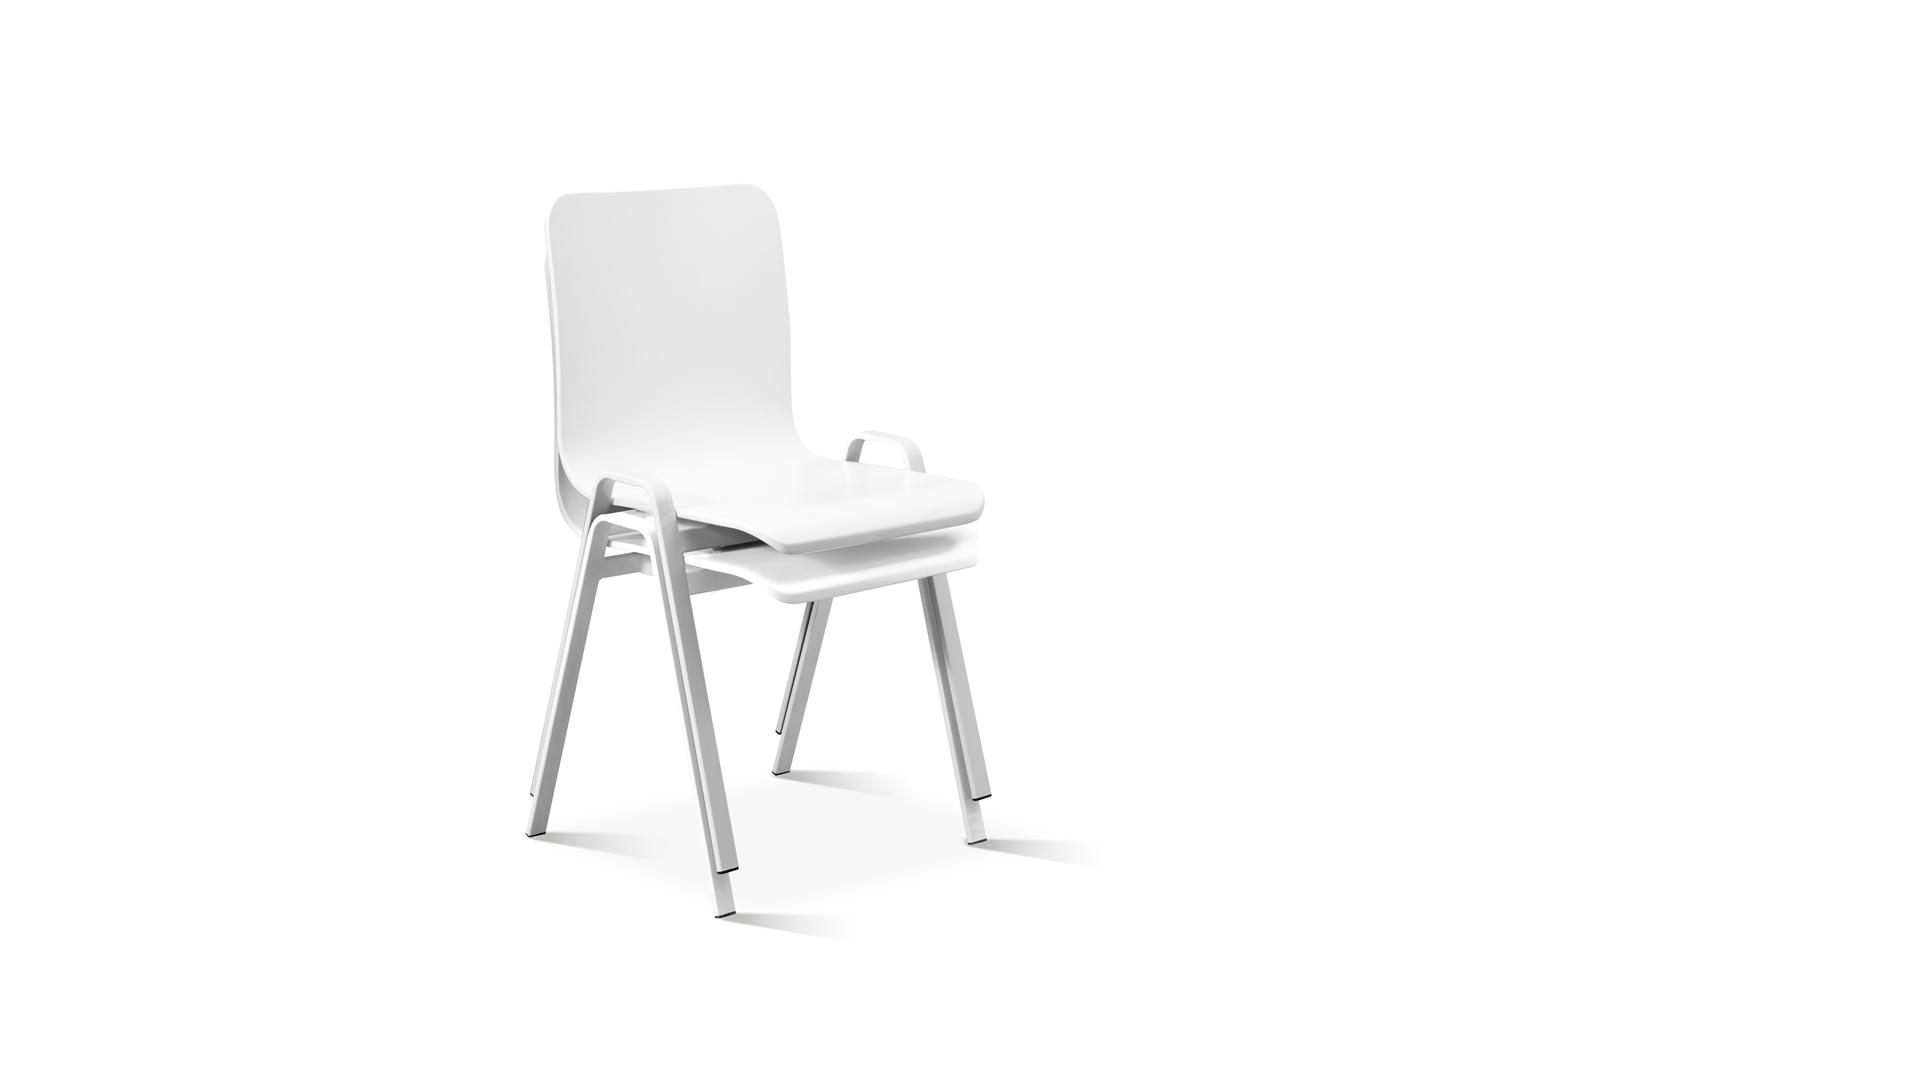 A字形椅腿,采用空心铁管弯折工艺,内角度精准控制在108°,上紧下松的布局,轻松叠摞收纳,椅座底面搭配有4个防护套,保证多把叠摞不划伤。